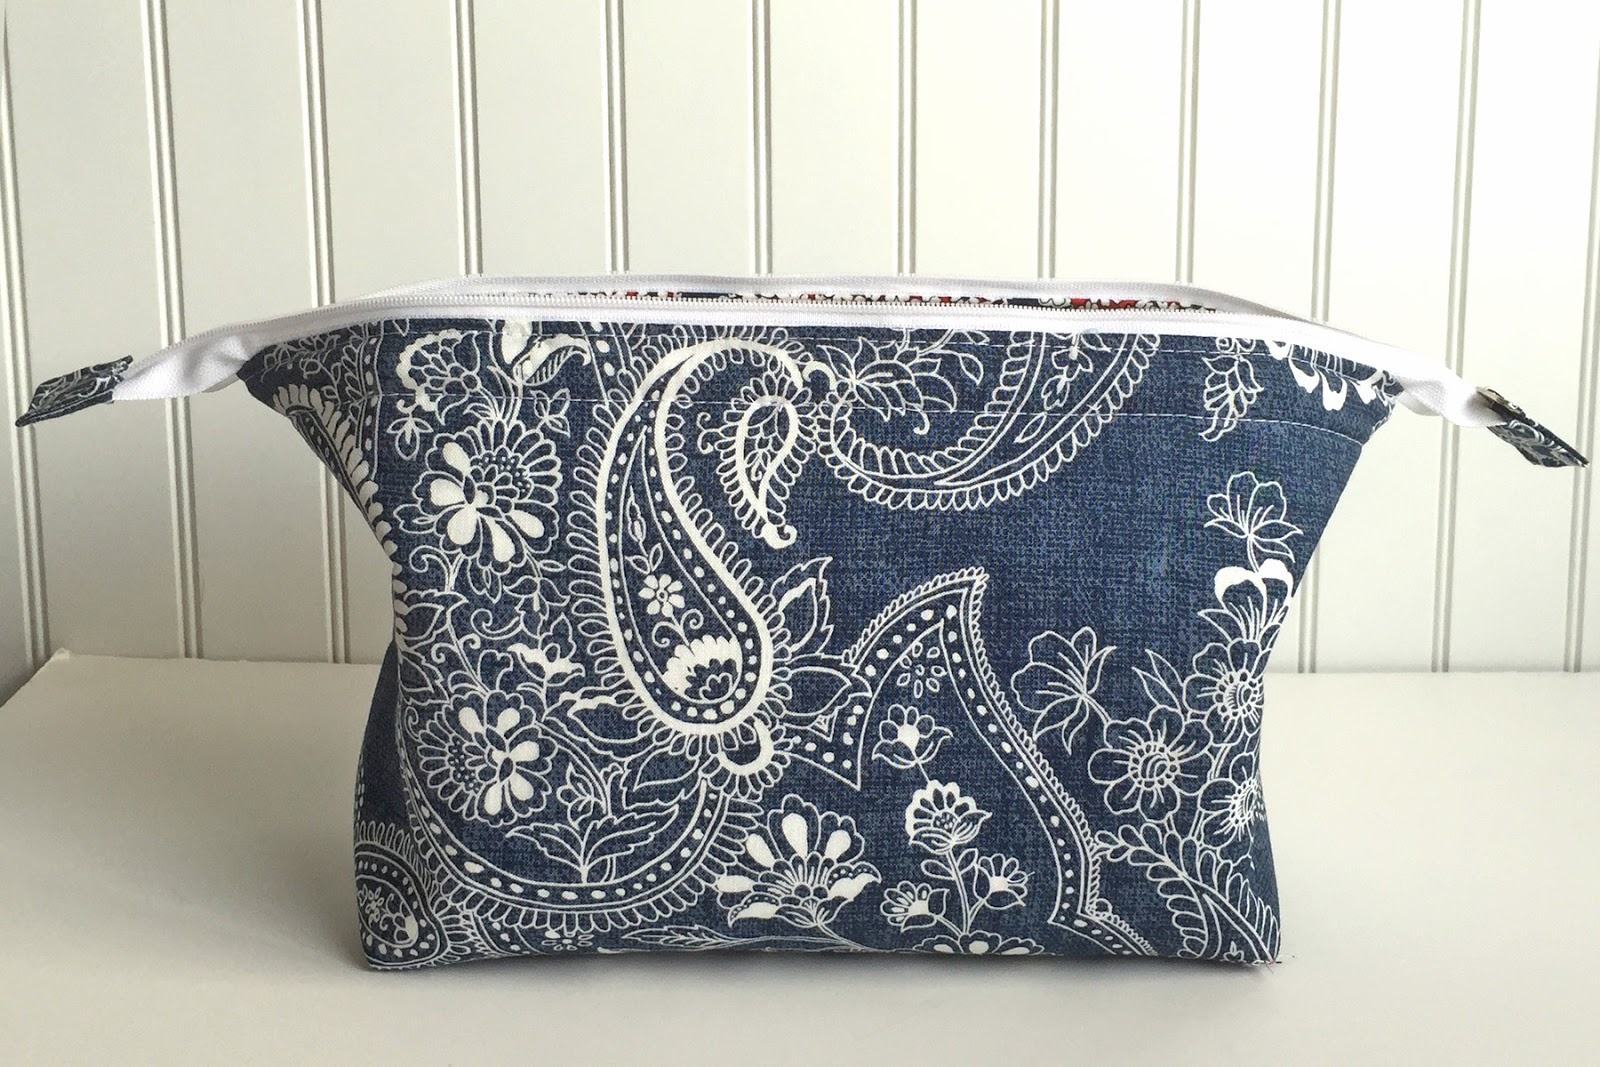 Emmaline bags sewing patterns and purse supplies the retreat bag by ellen wiedman jeuxipadfo Gallery